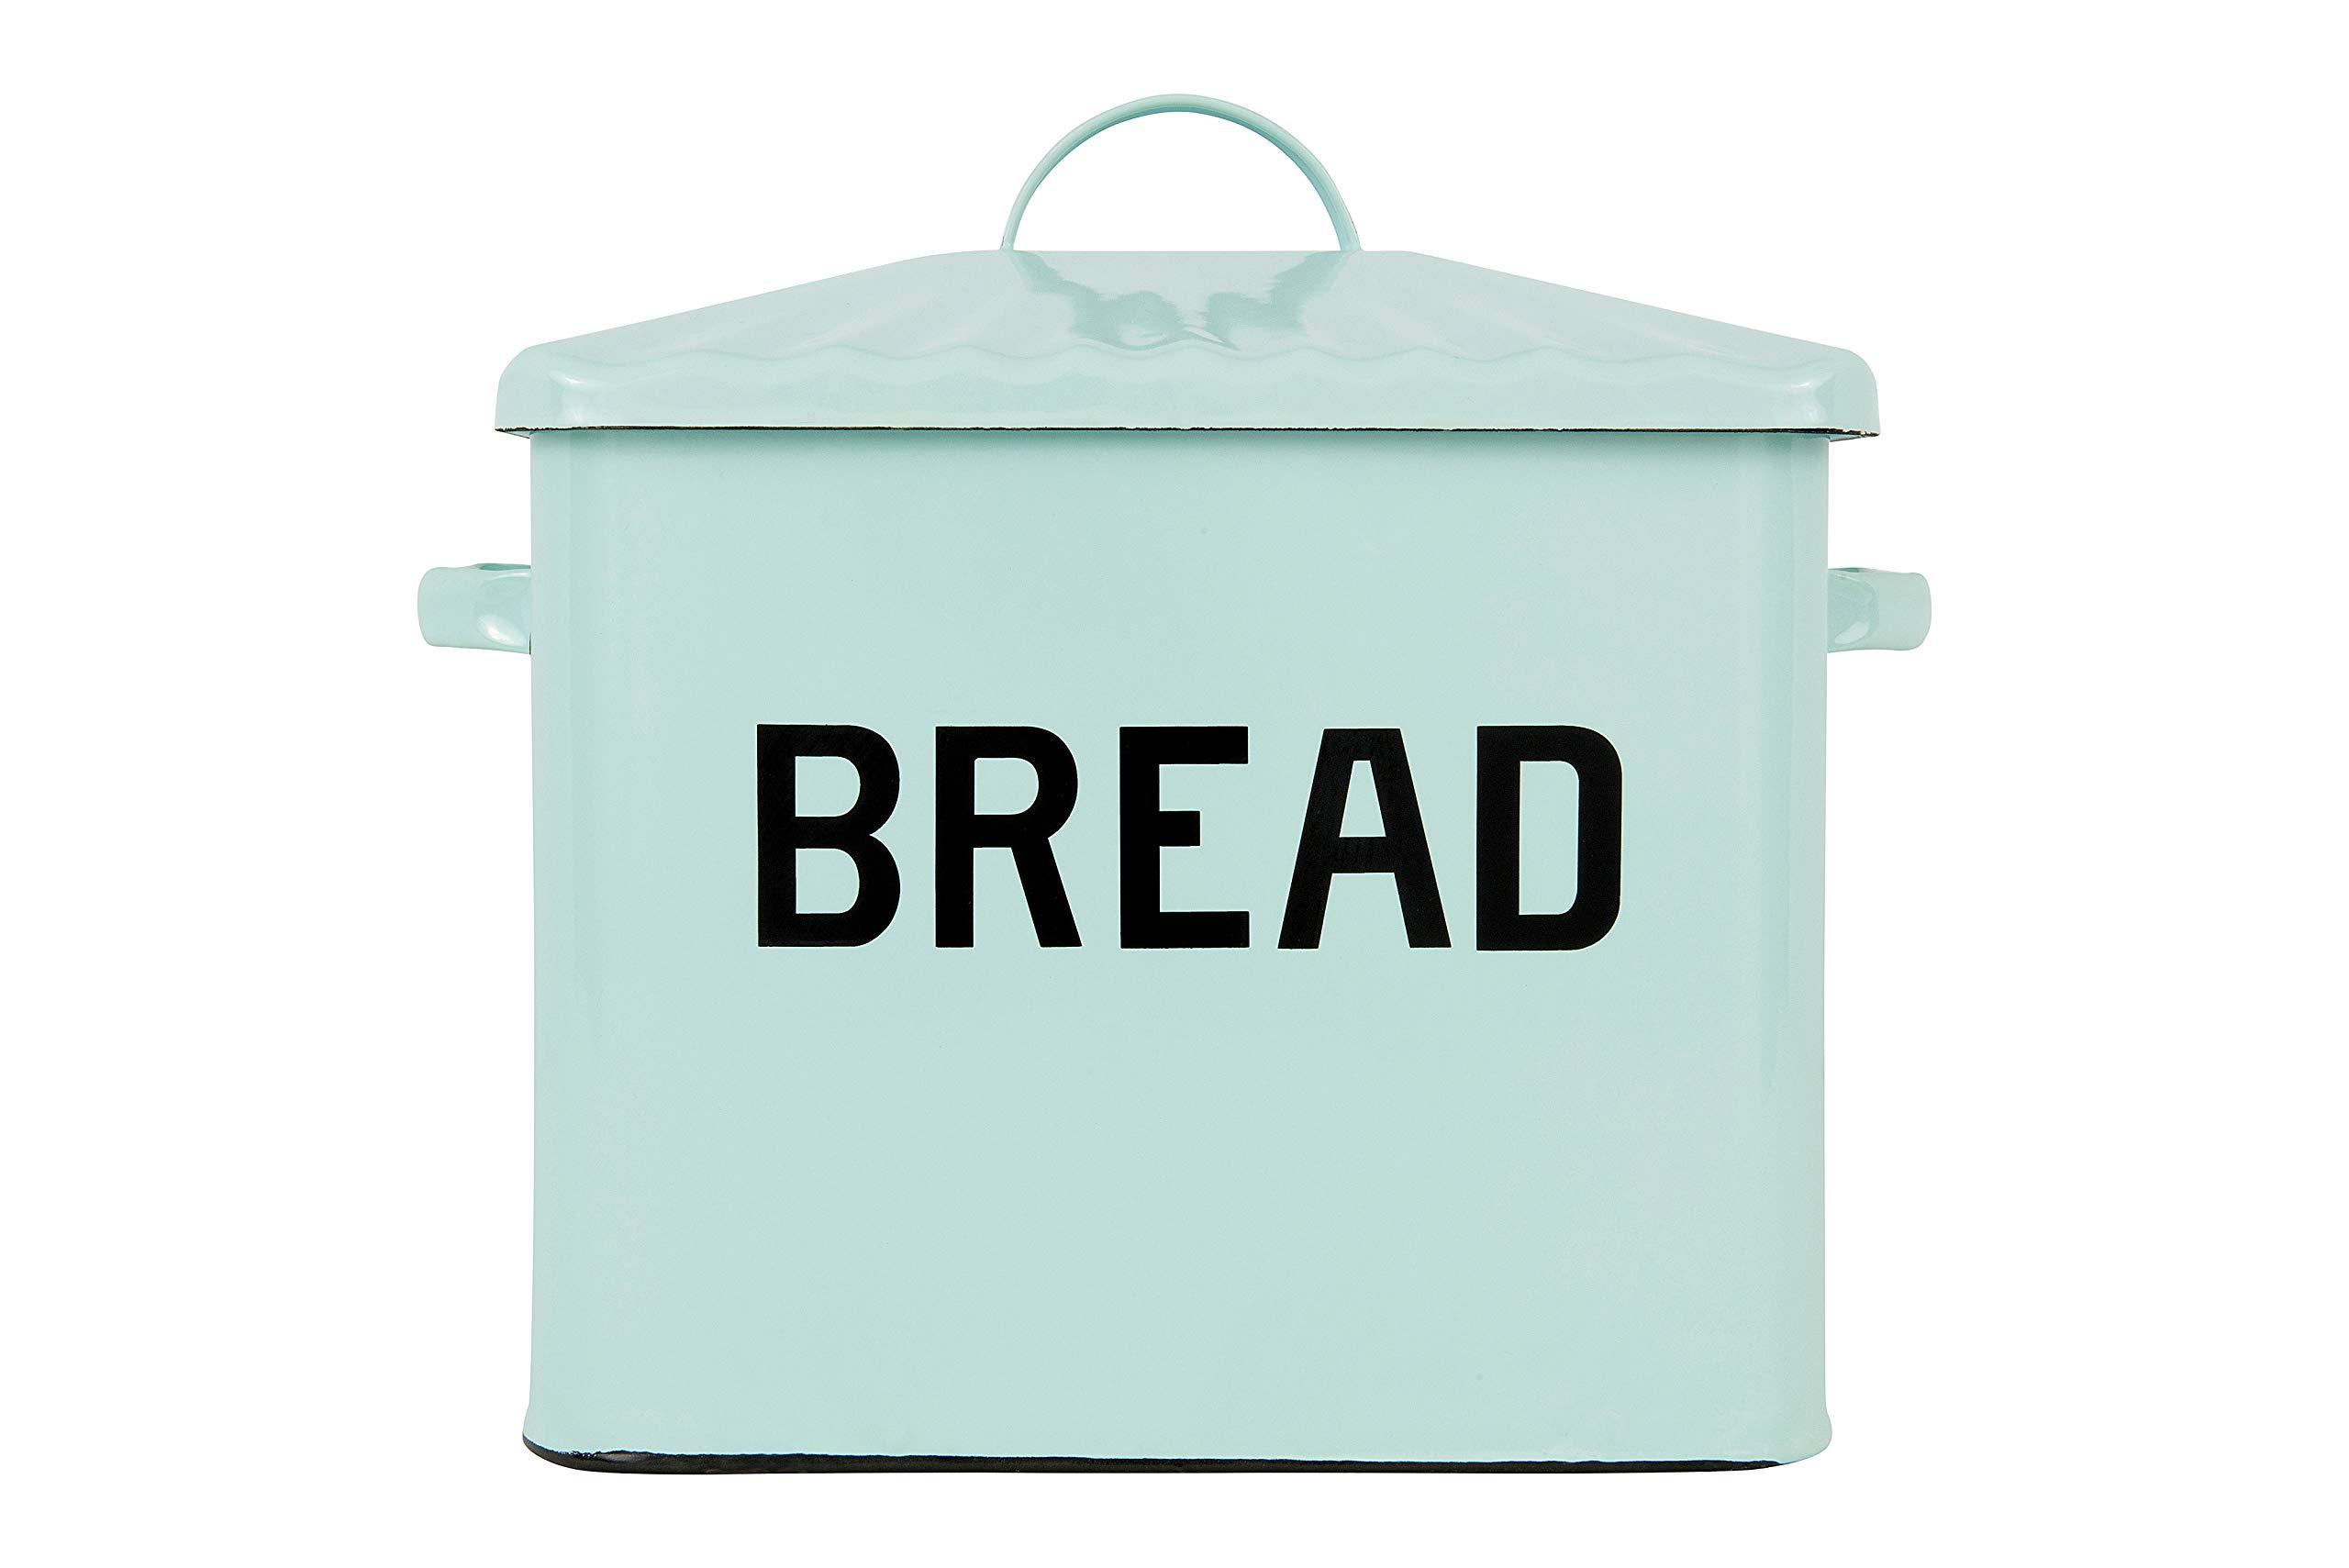 Creative Co-Op Distressed WhiteBREAD Box with Lid Renewed